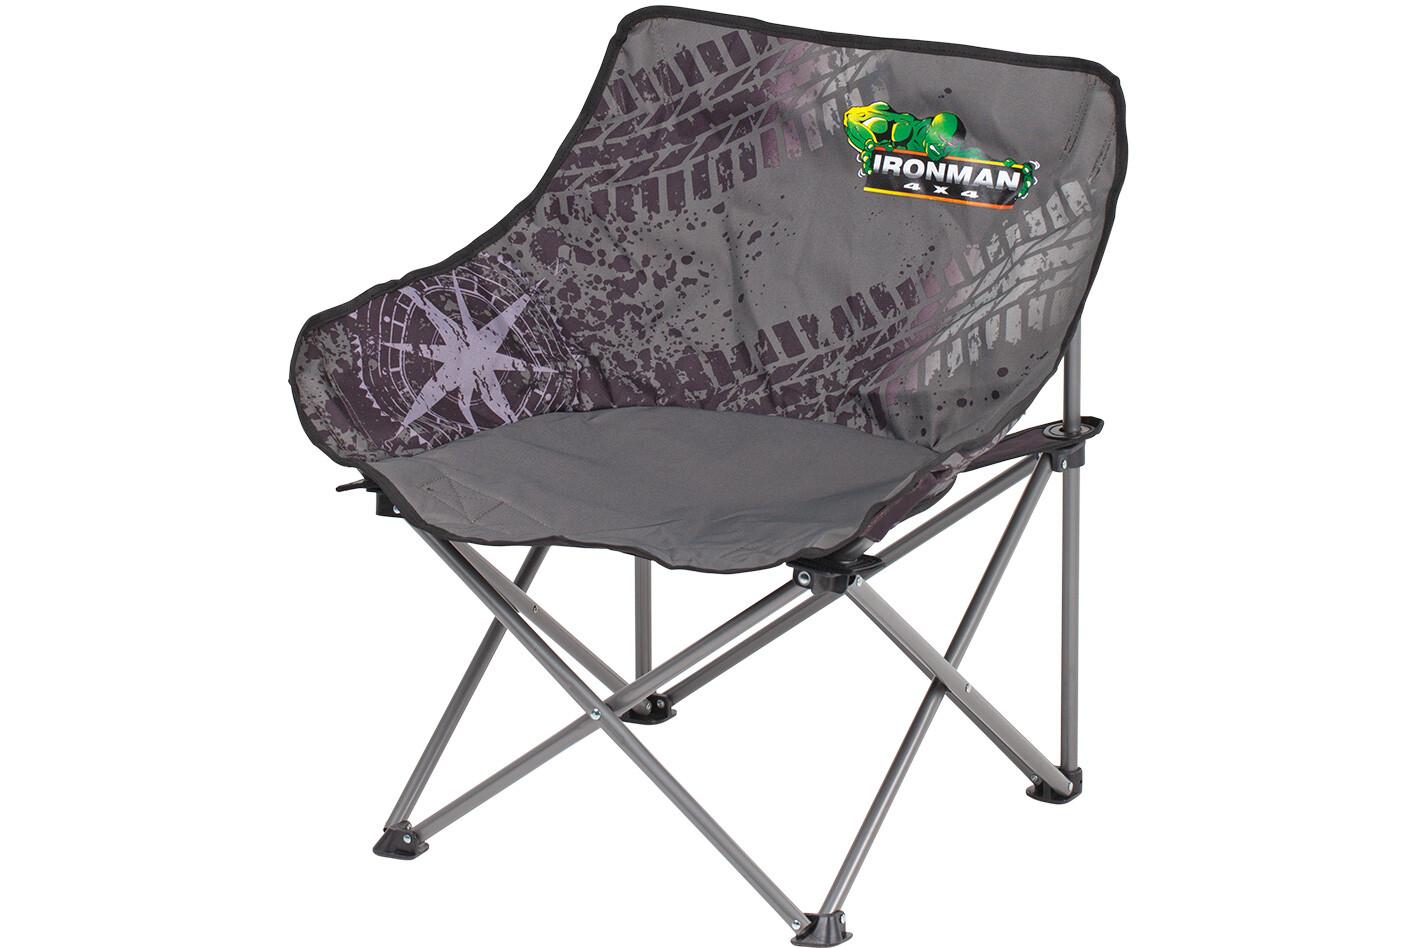 ironman camp chairs